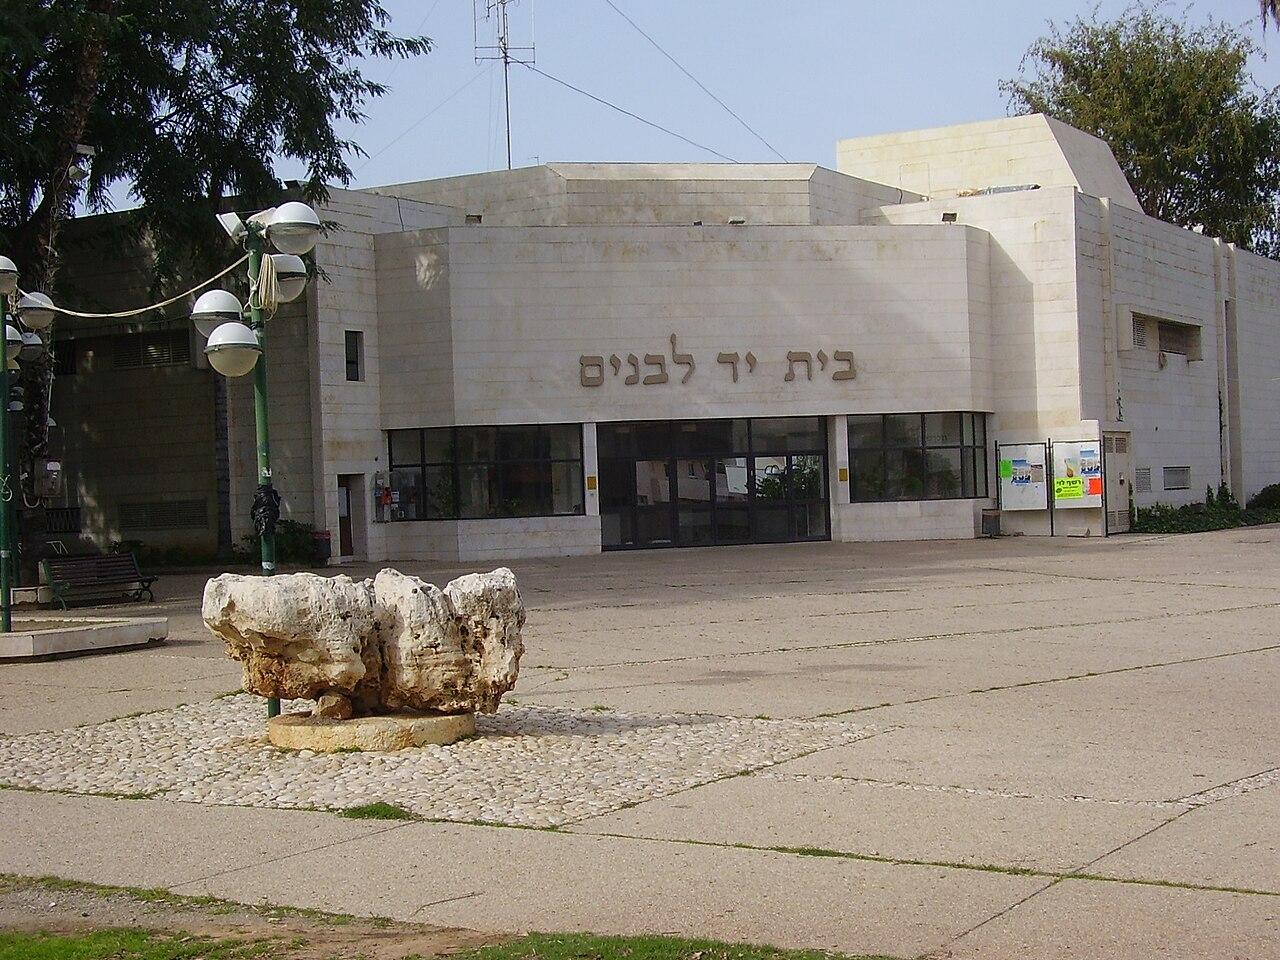 File:PikiWiki Israel 7393 yad labanim house in ramat hasharon.jpg ...